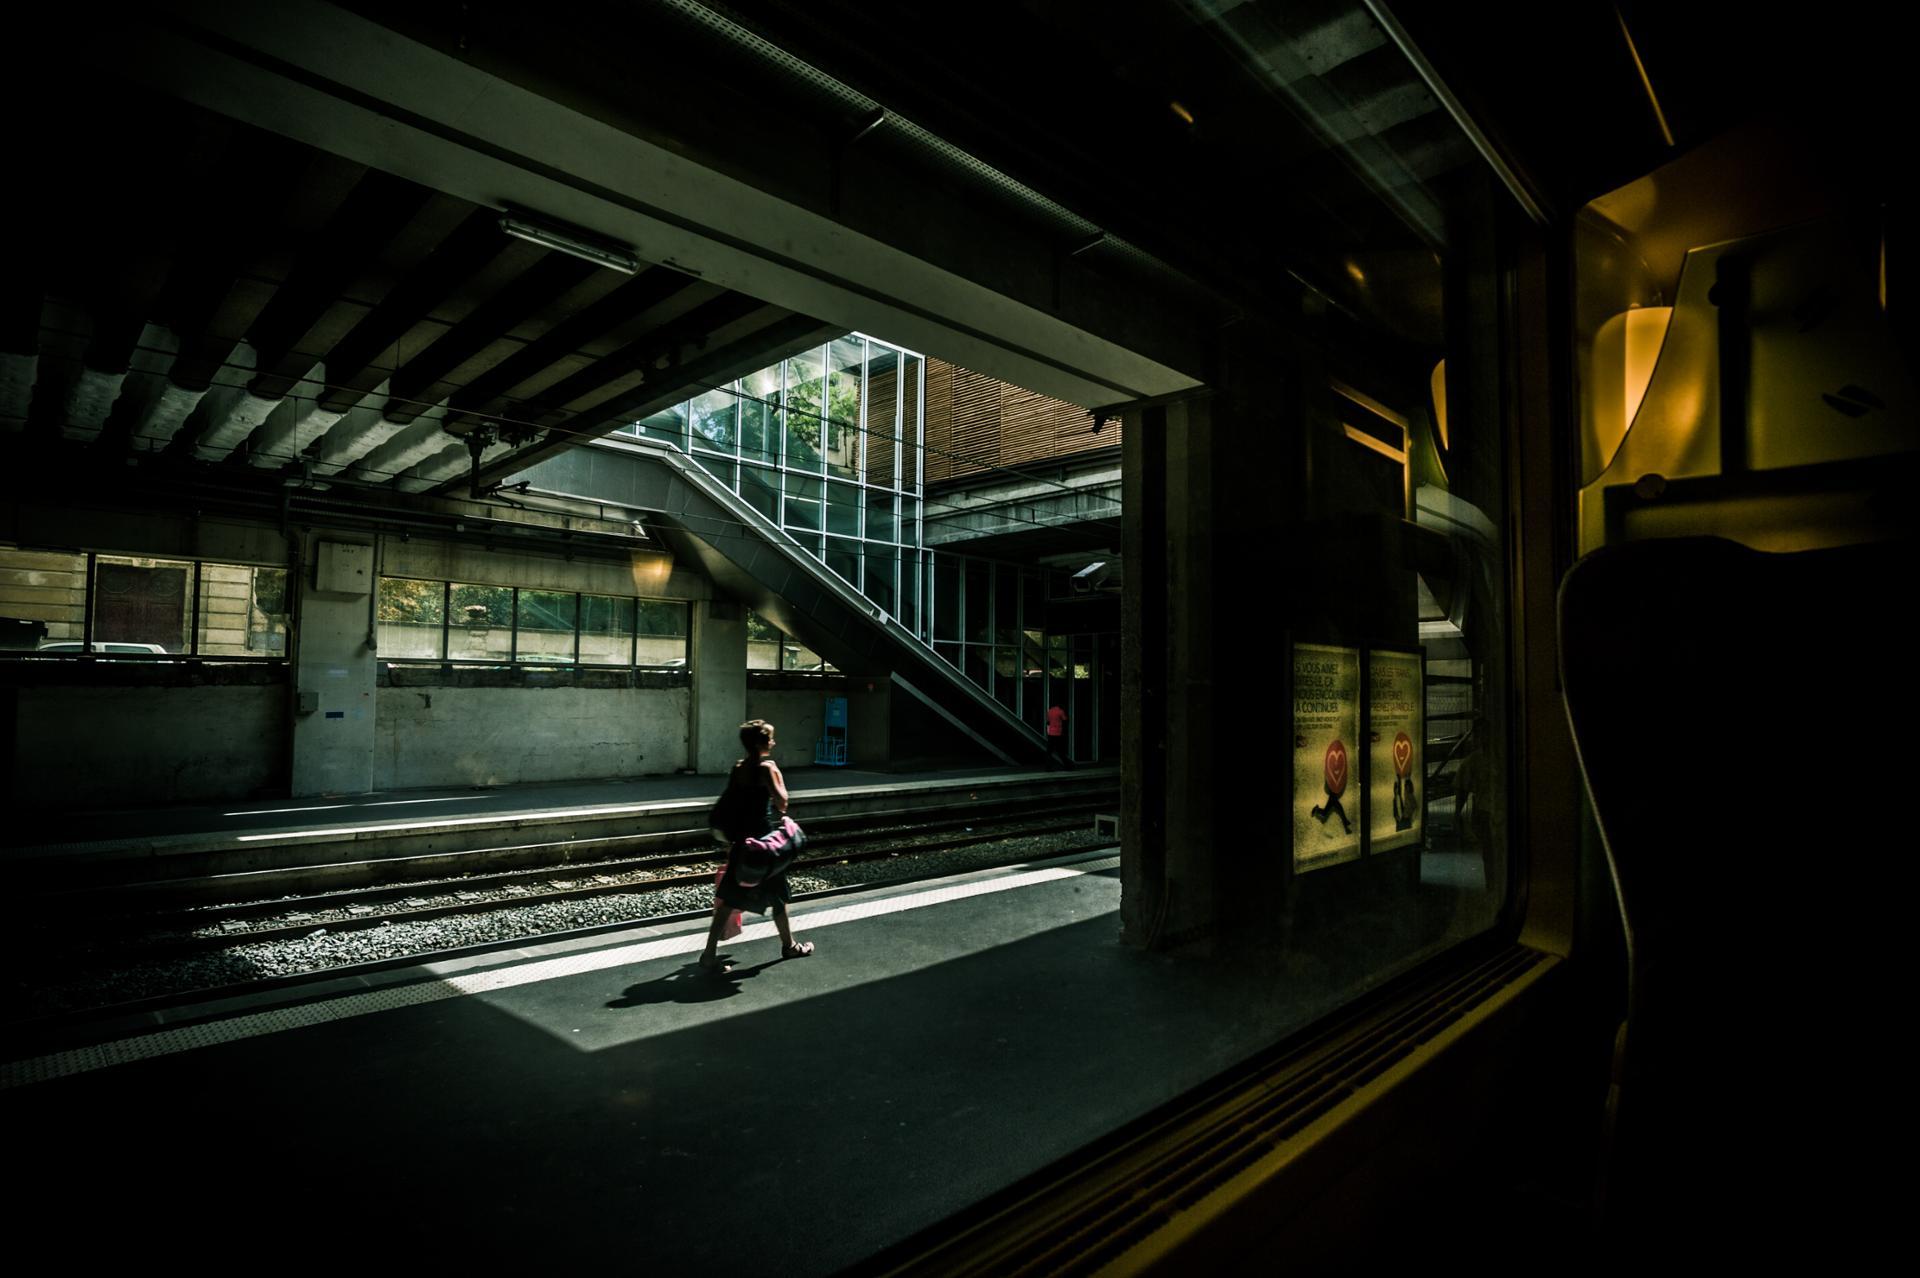 Inconnue de gare